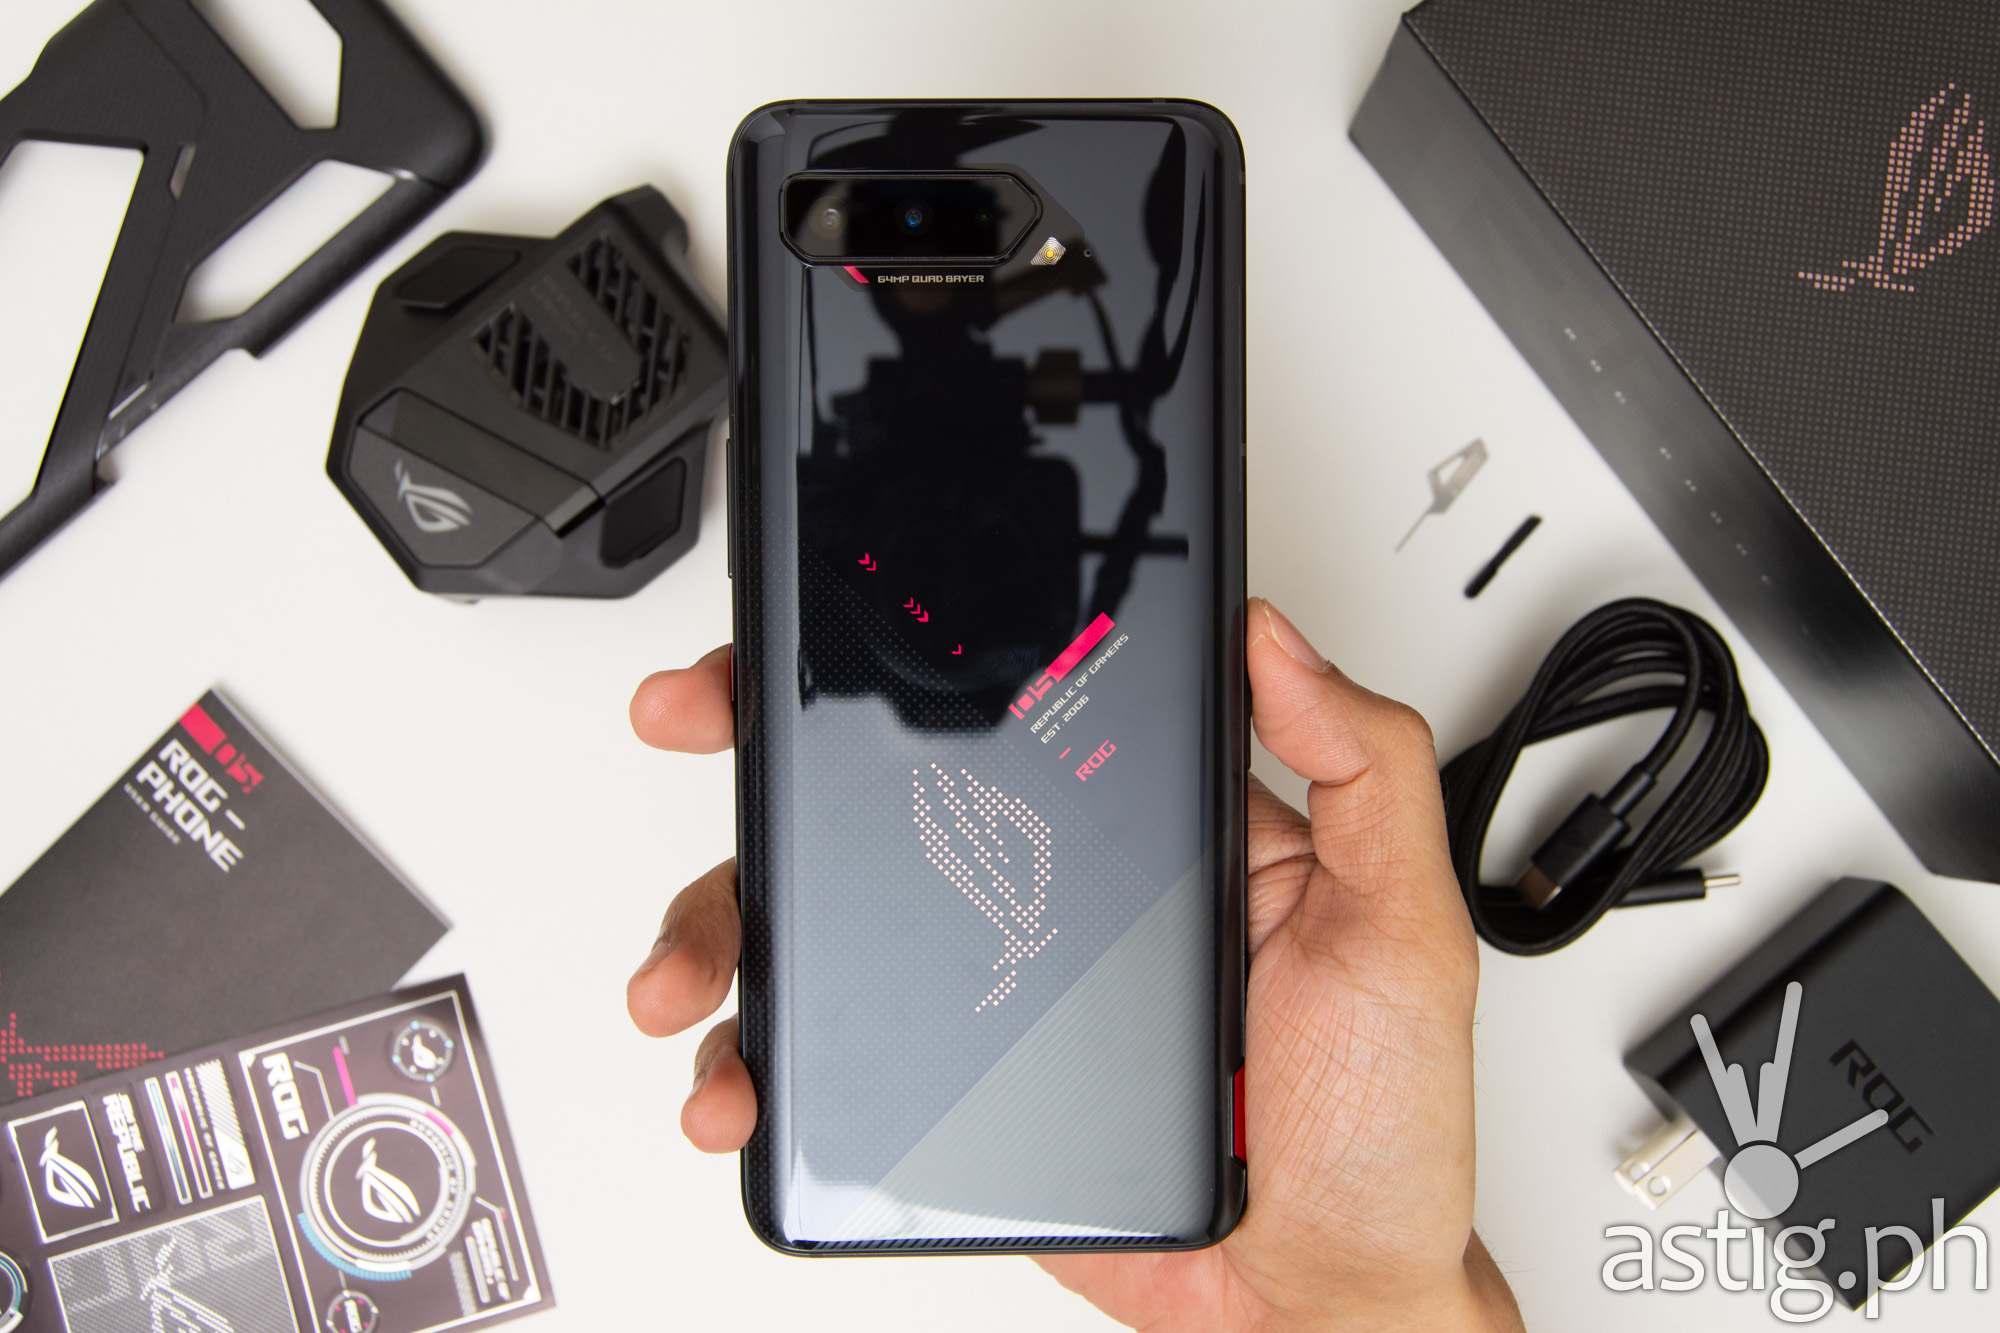 Handheld back - ROG Phone 5 (Philippines)